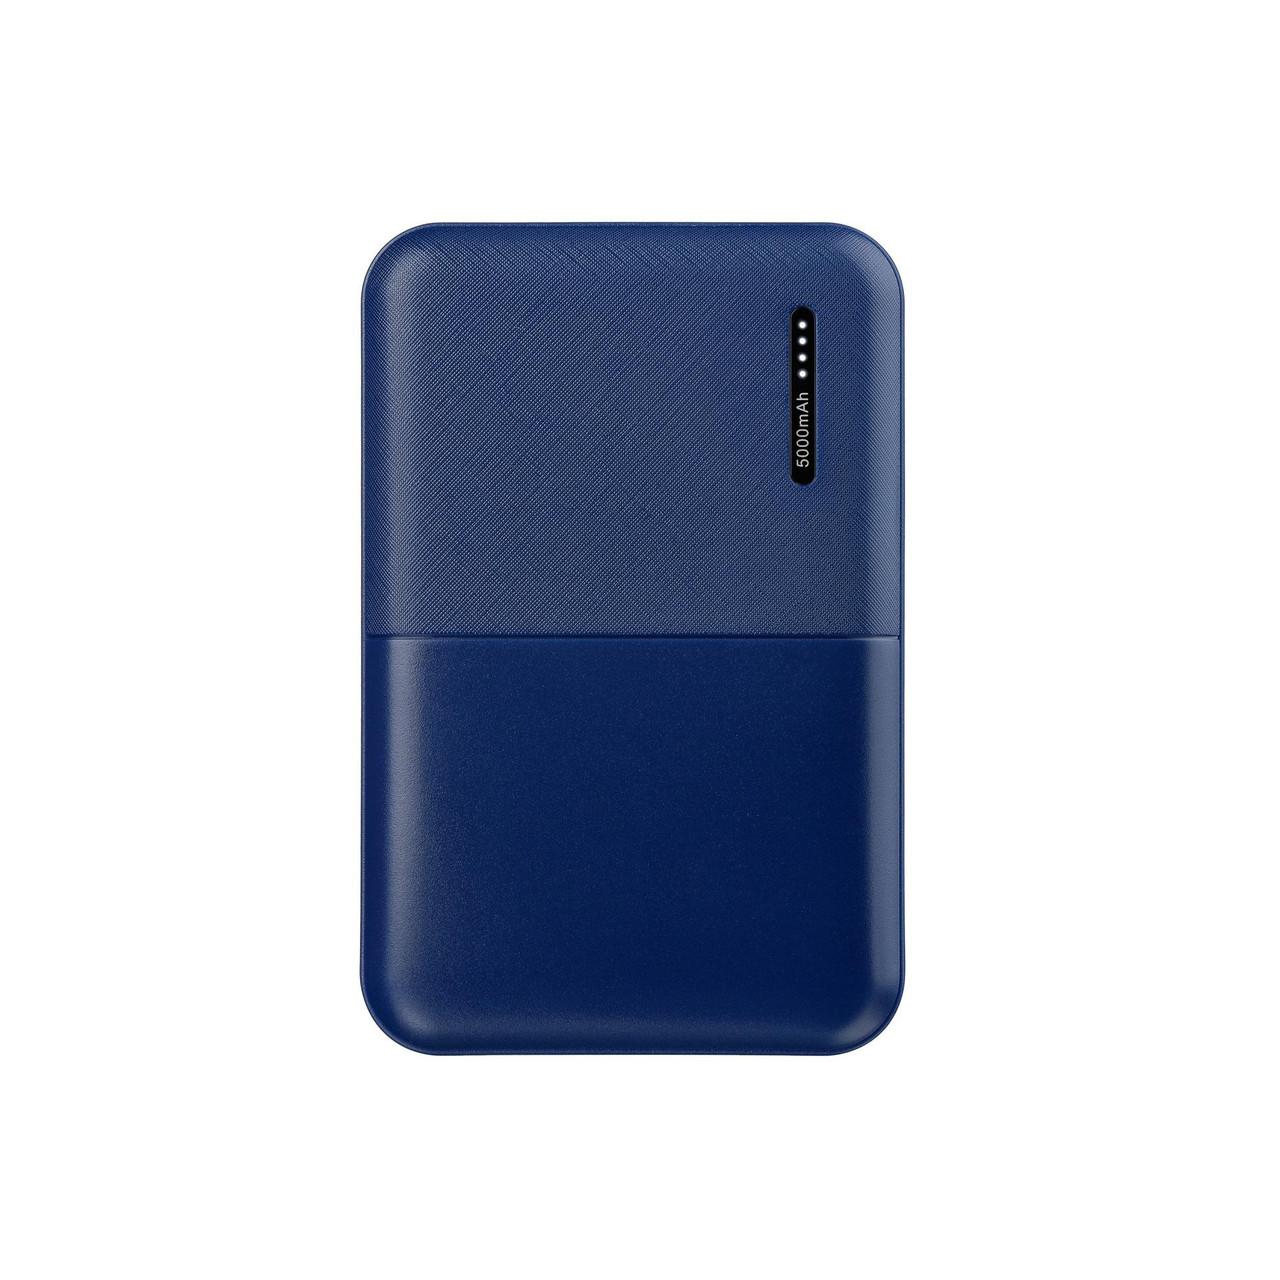 Повербанк 2E 5000mAh Blue (2E-PB500B-BLUE)